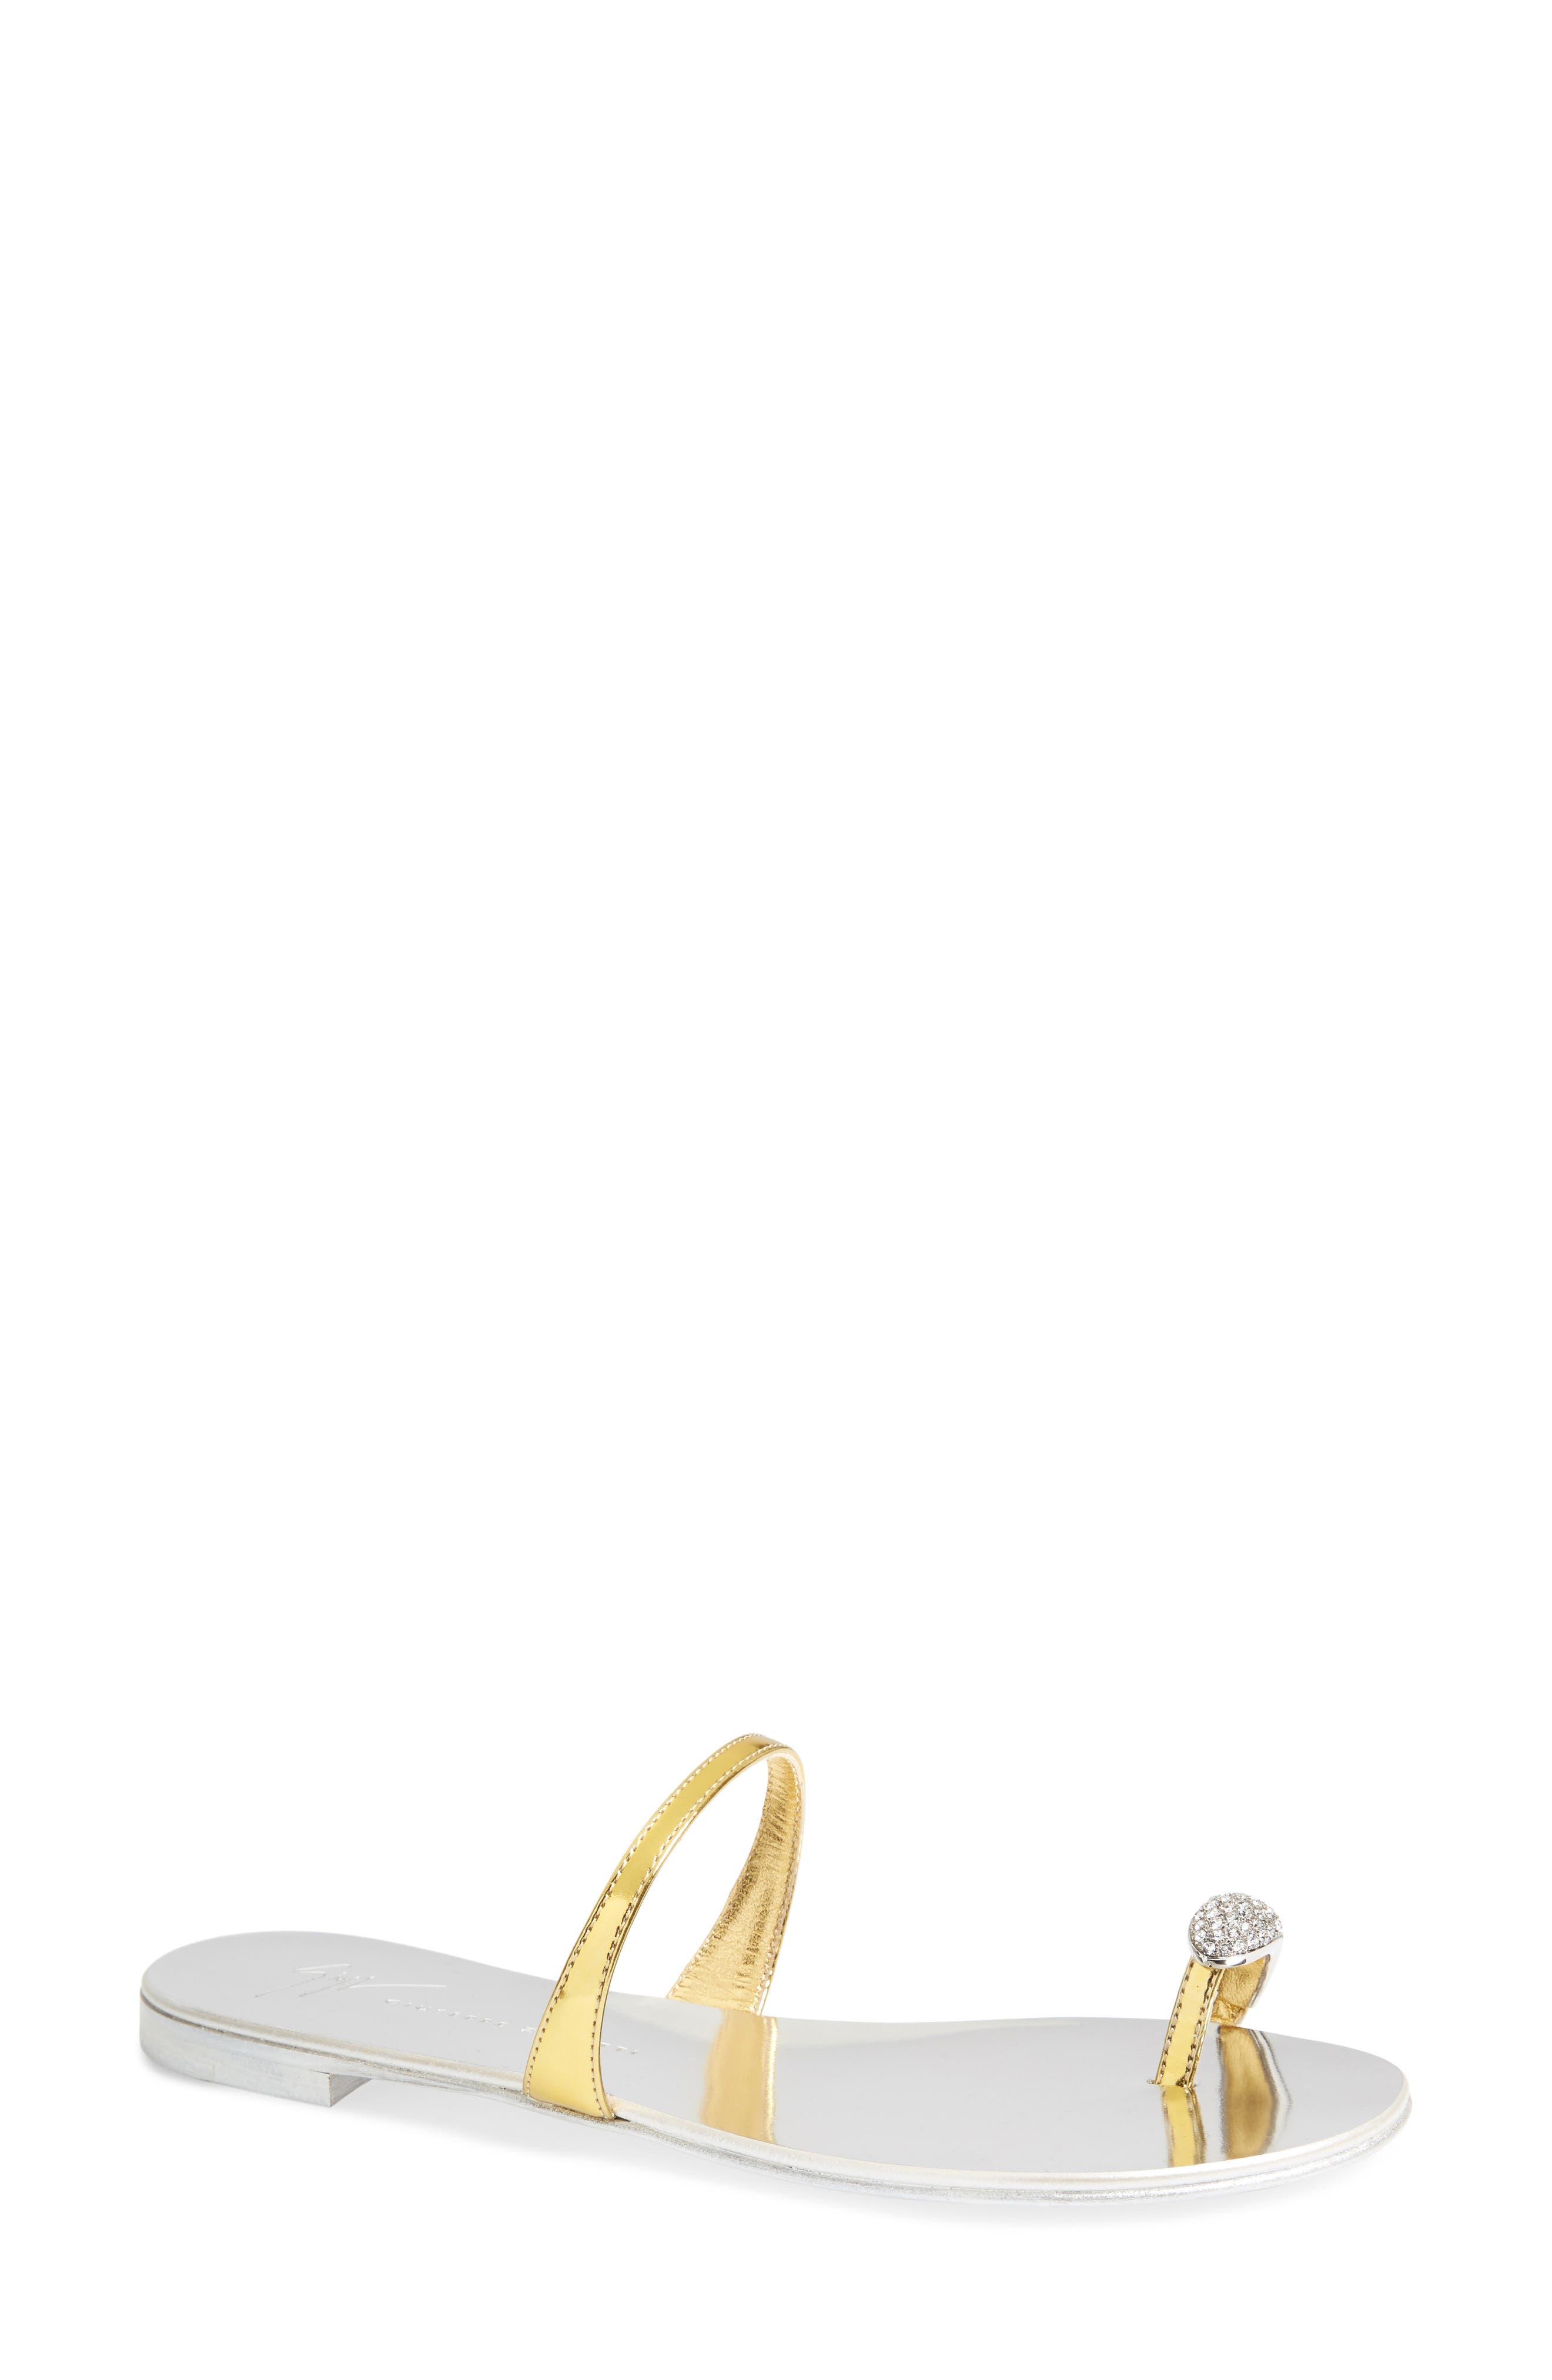 Nuvorock Crystal Embellished Toe Loop Sandal,                             Main thumbnail 1, color,                             710